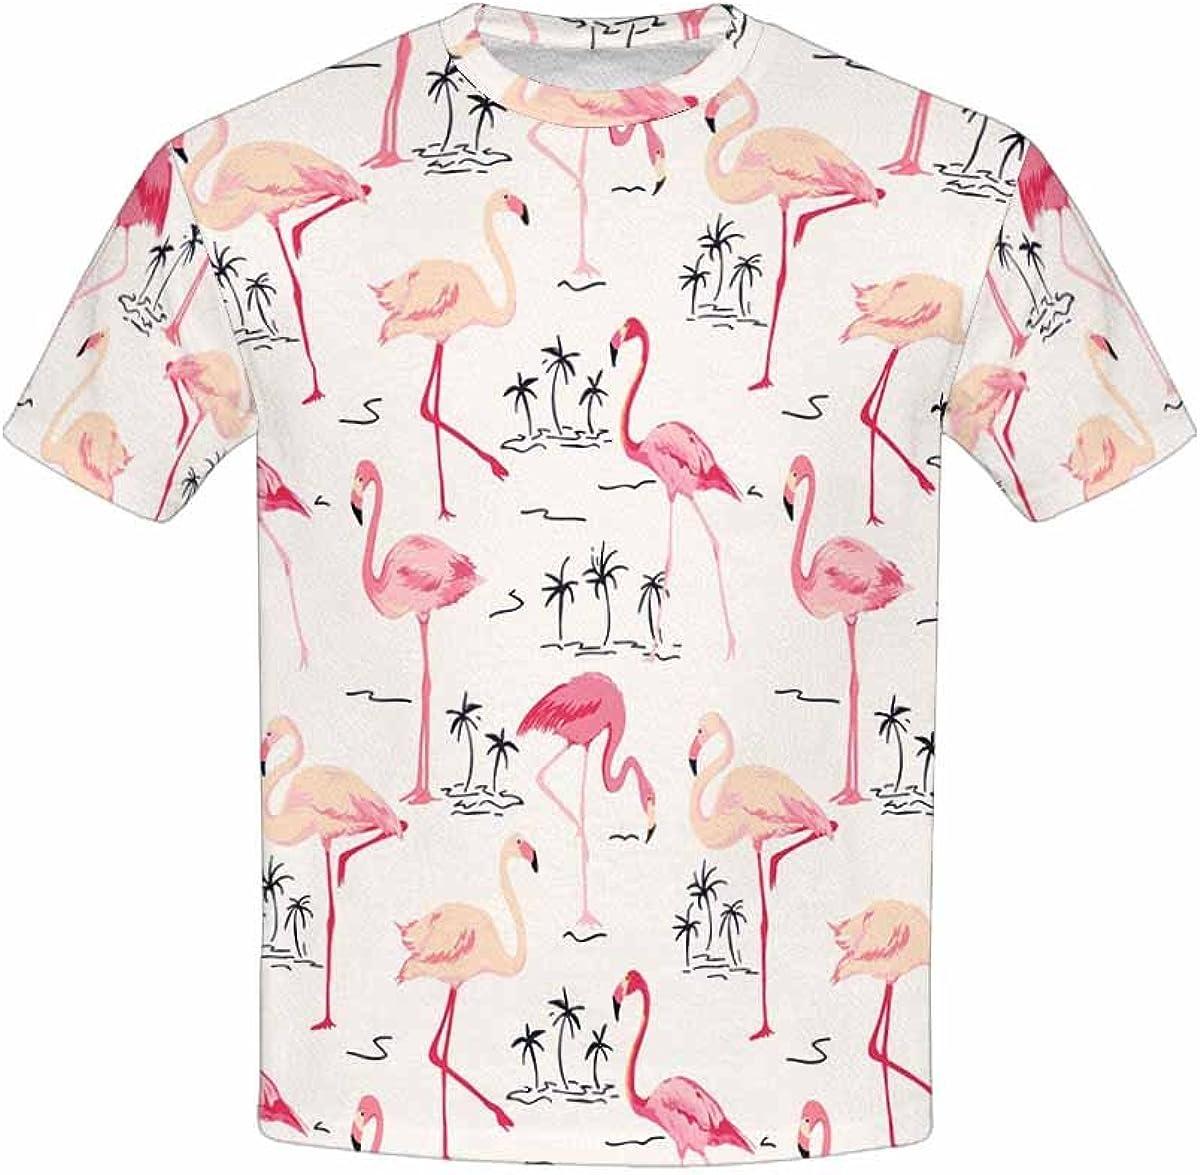 INTERESTPRINT Kids T-Shirts Flamingo Bird Background XS-XL